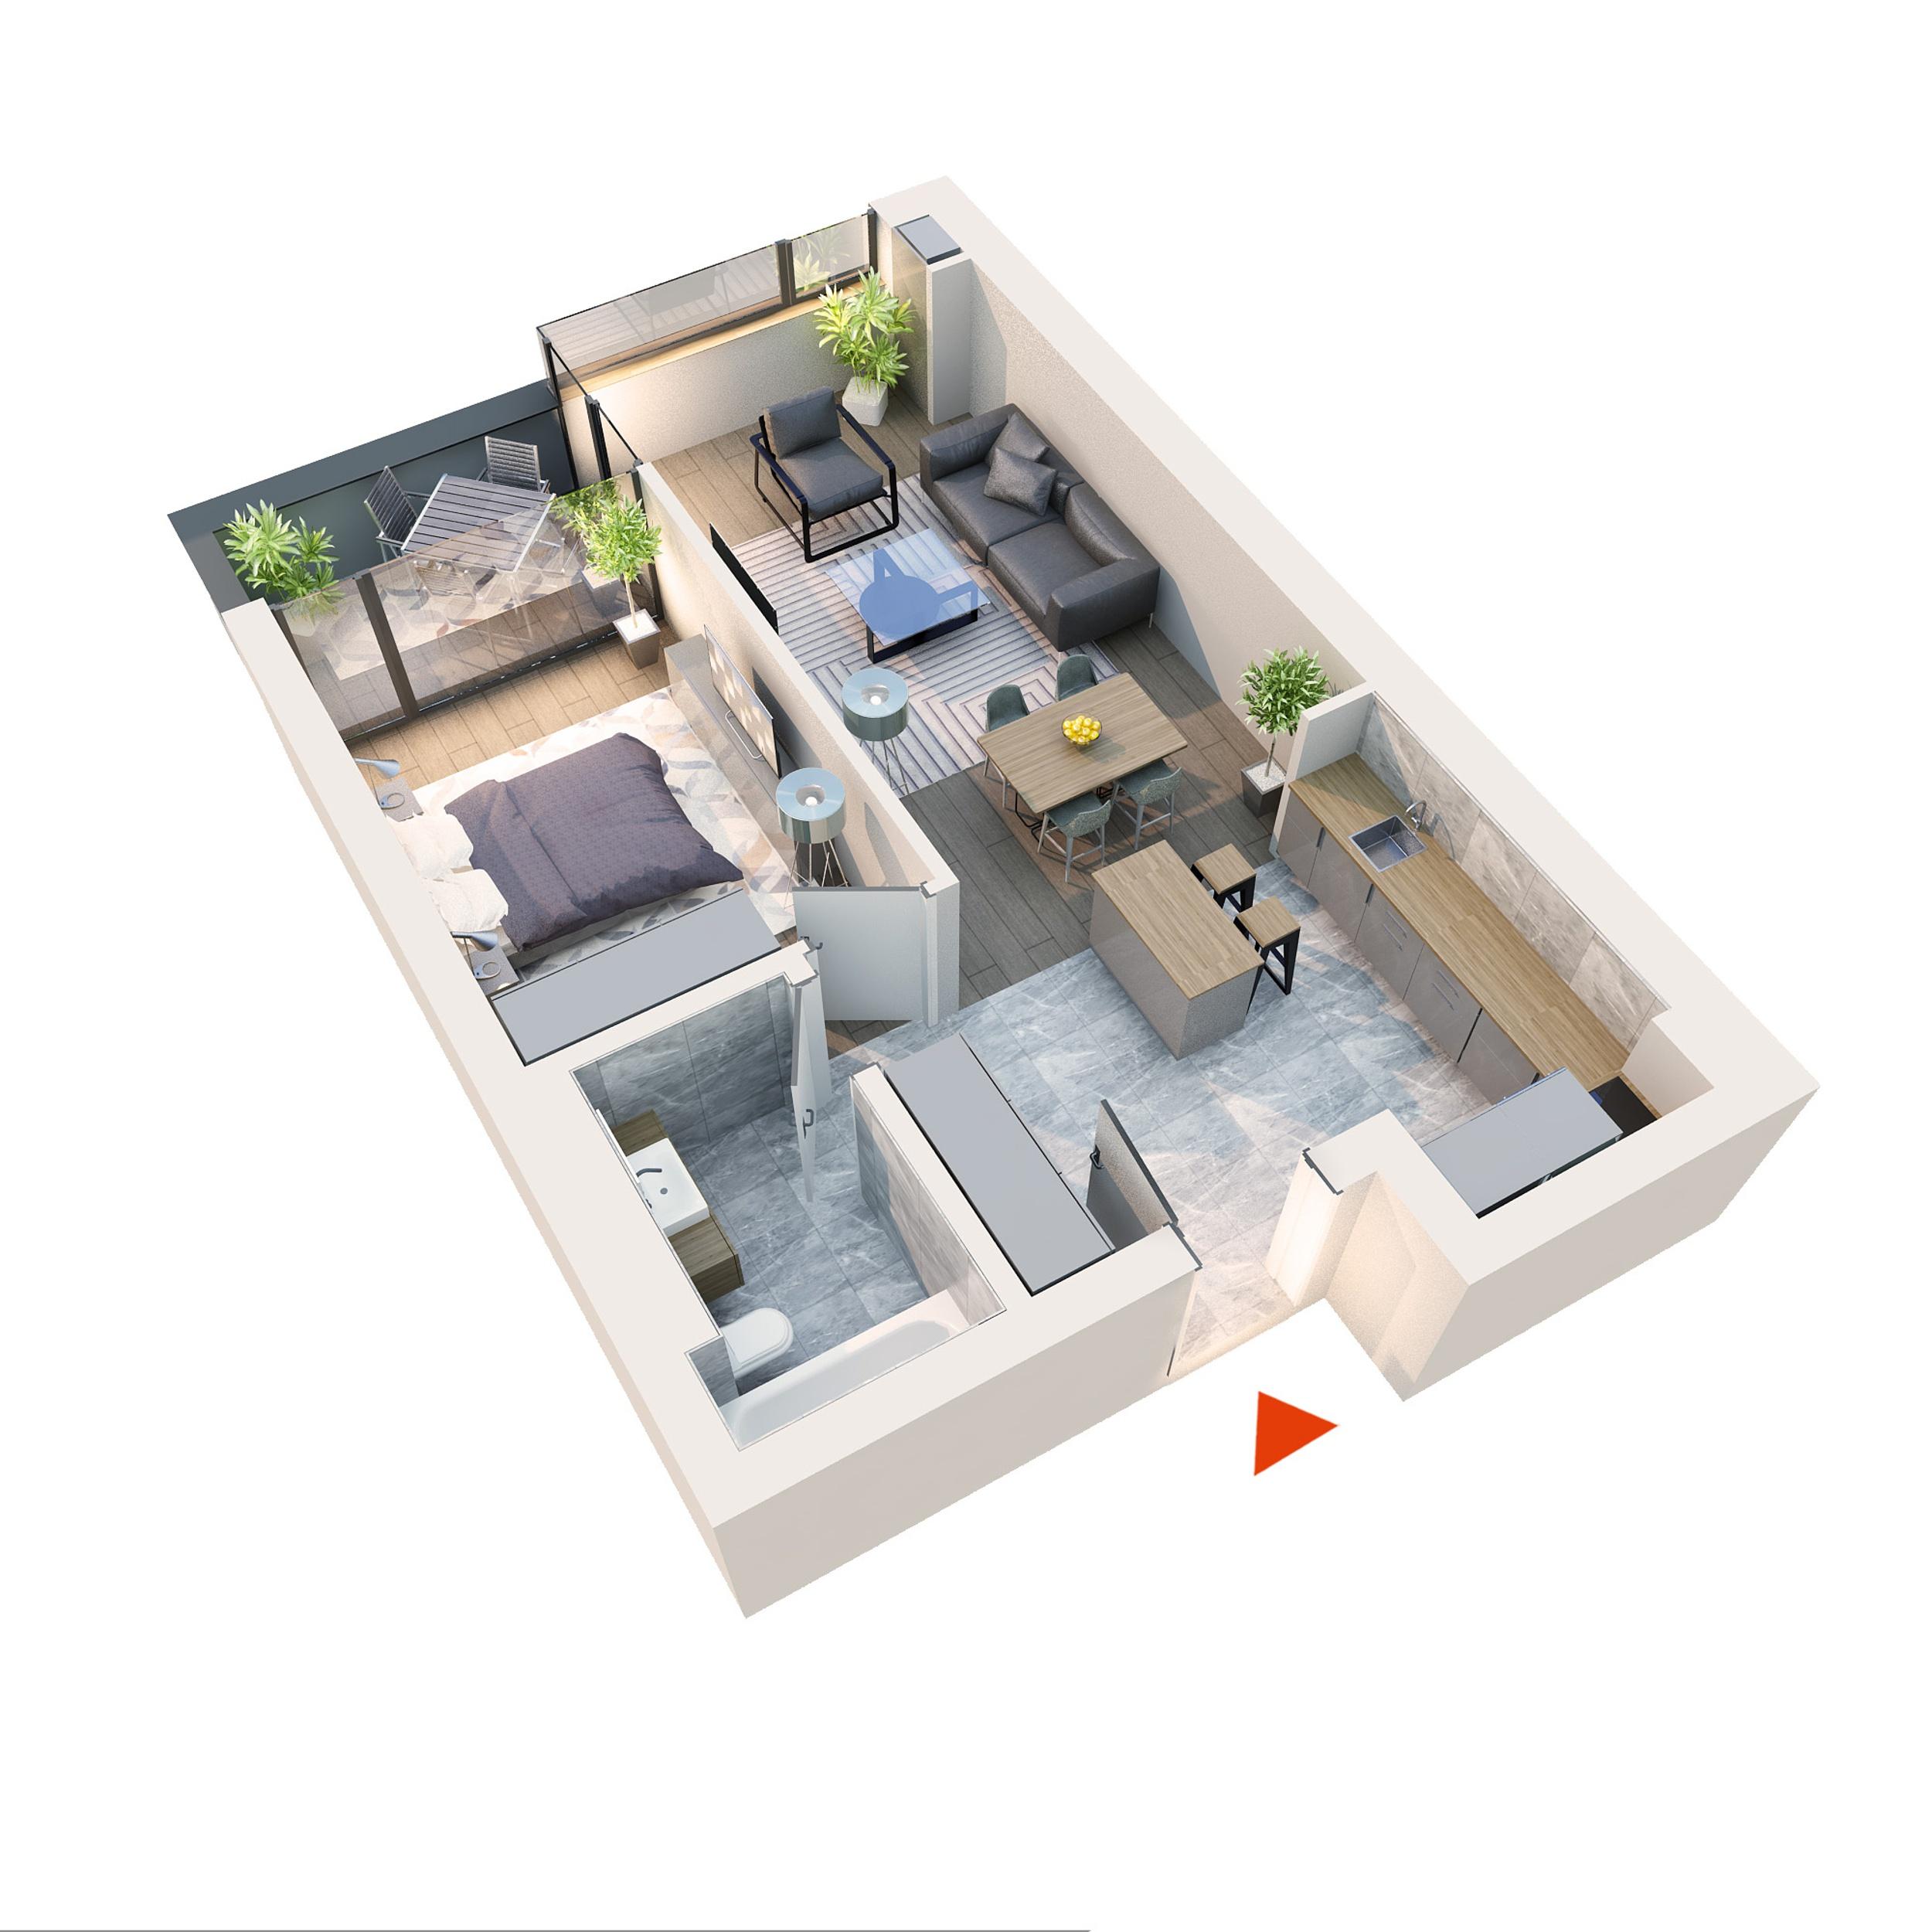 Apartament 2 camere tip 2D2.1 B12 Logie | Etaj 1-5 | Corp C8 | Faza 2